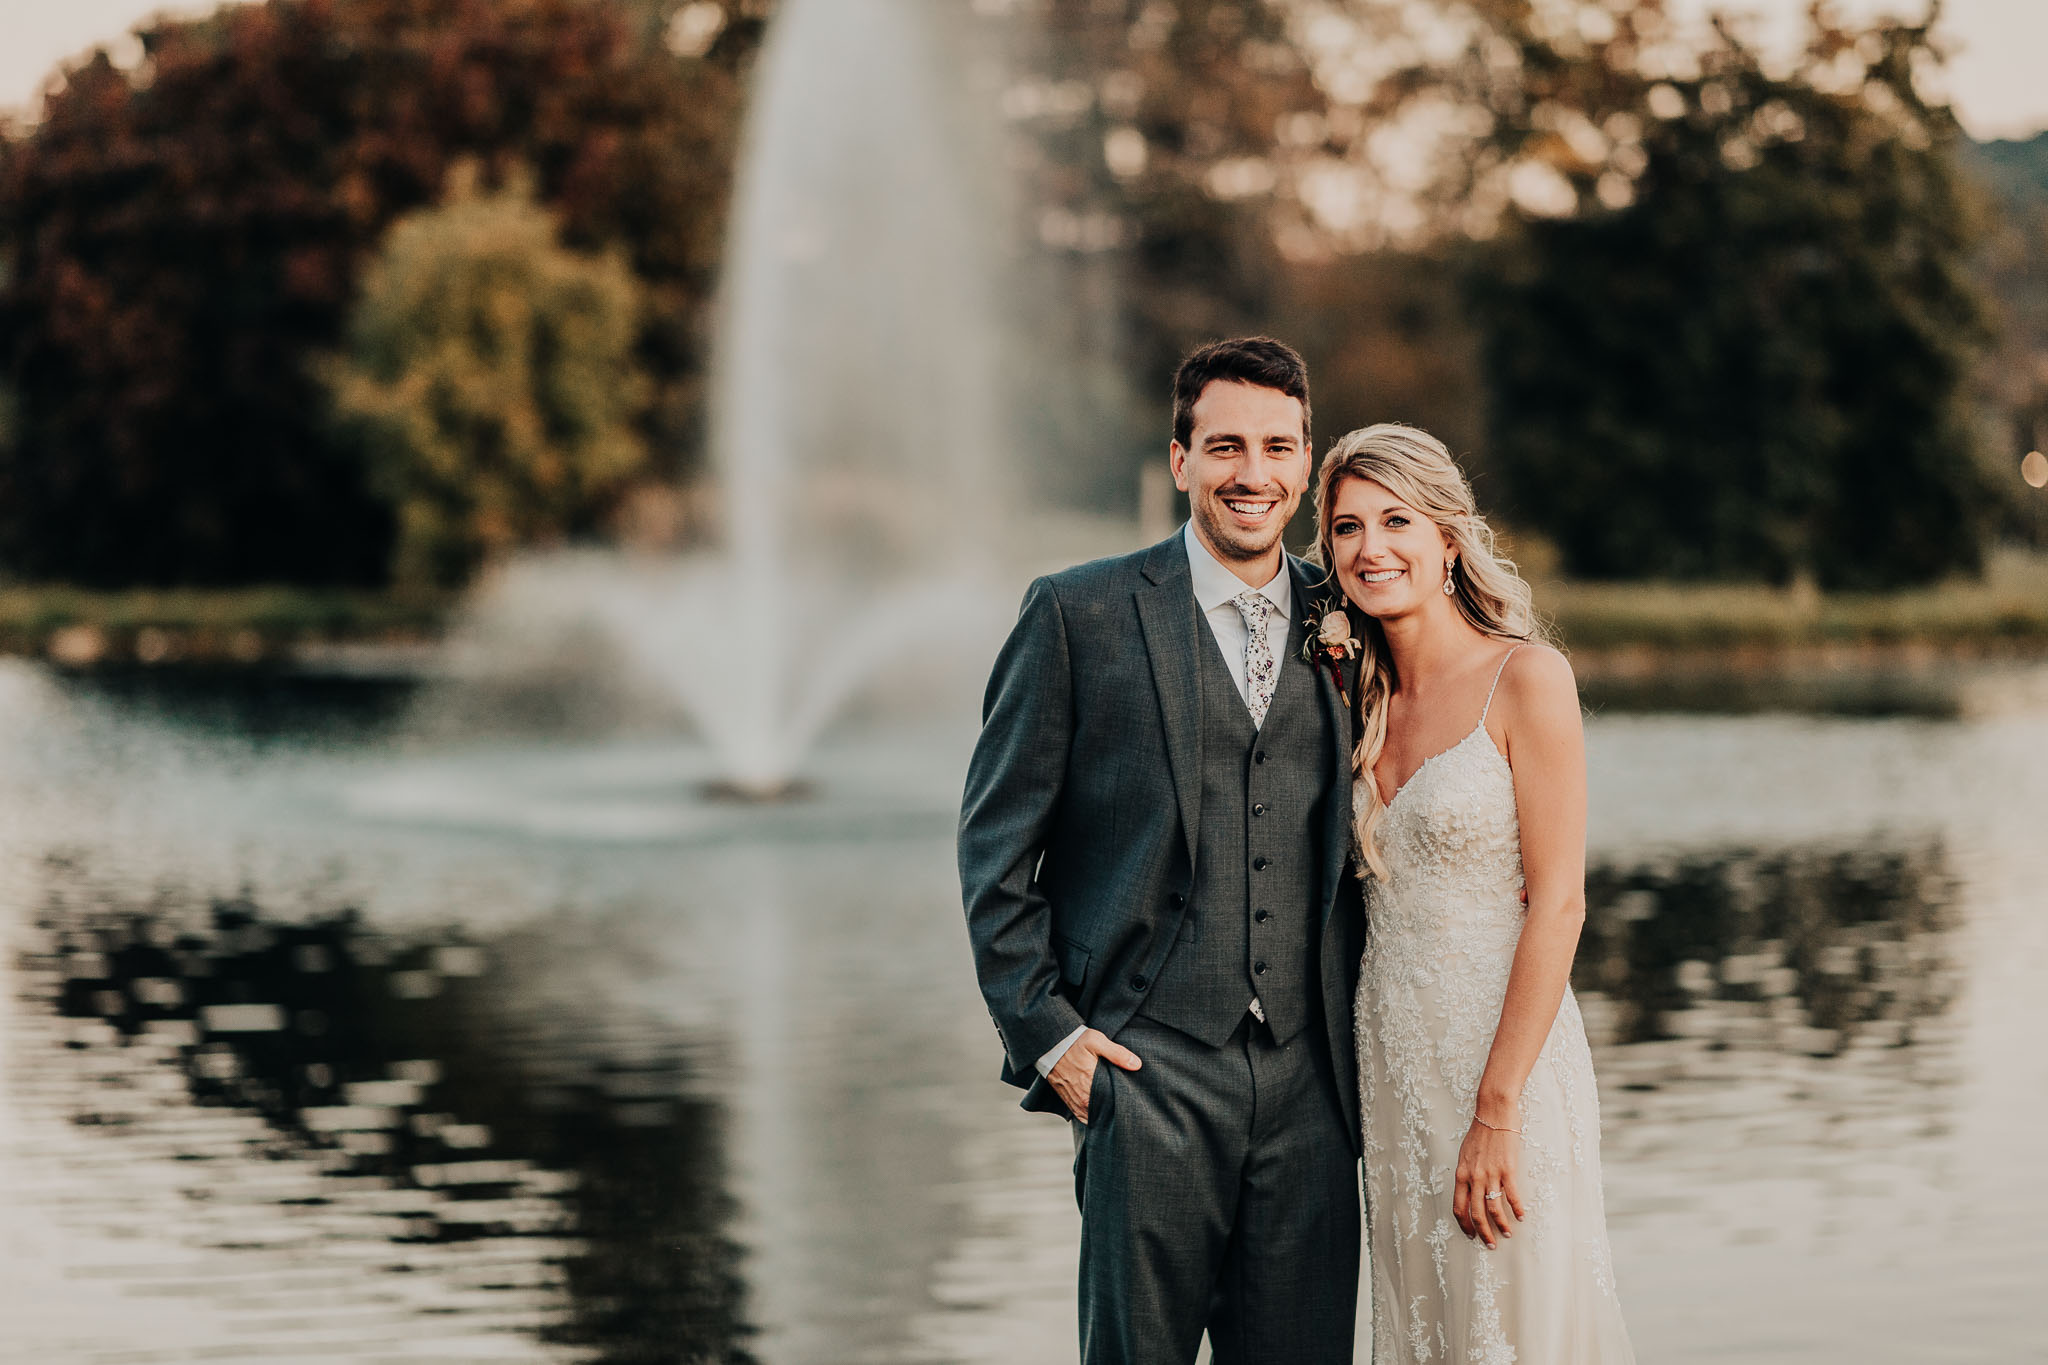 Frosty-Valley-September-Wedding-8490.jpg